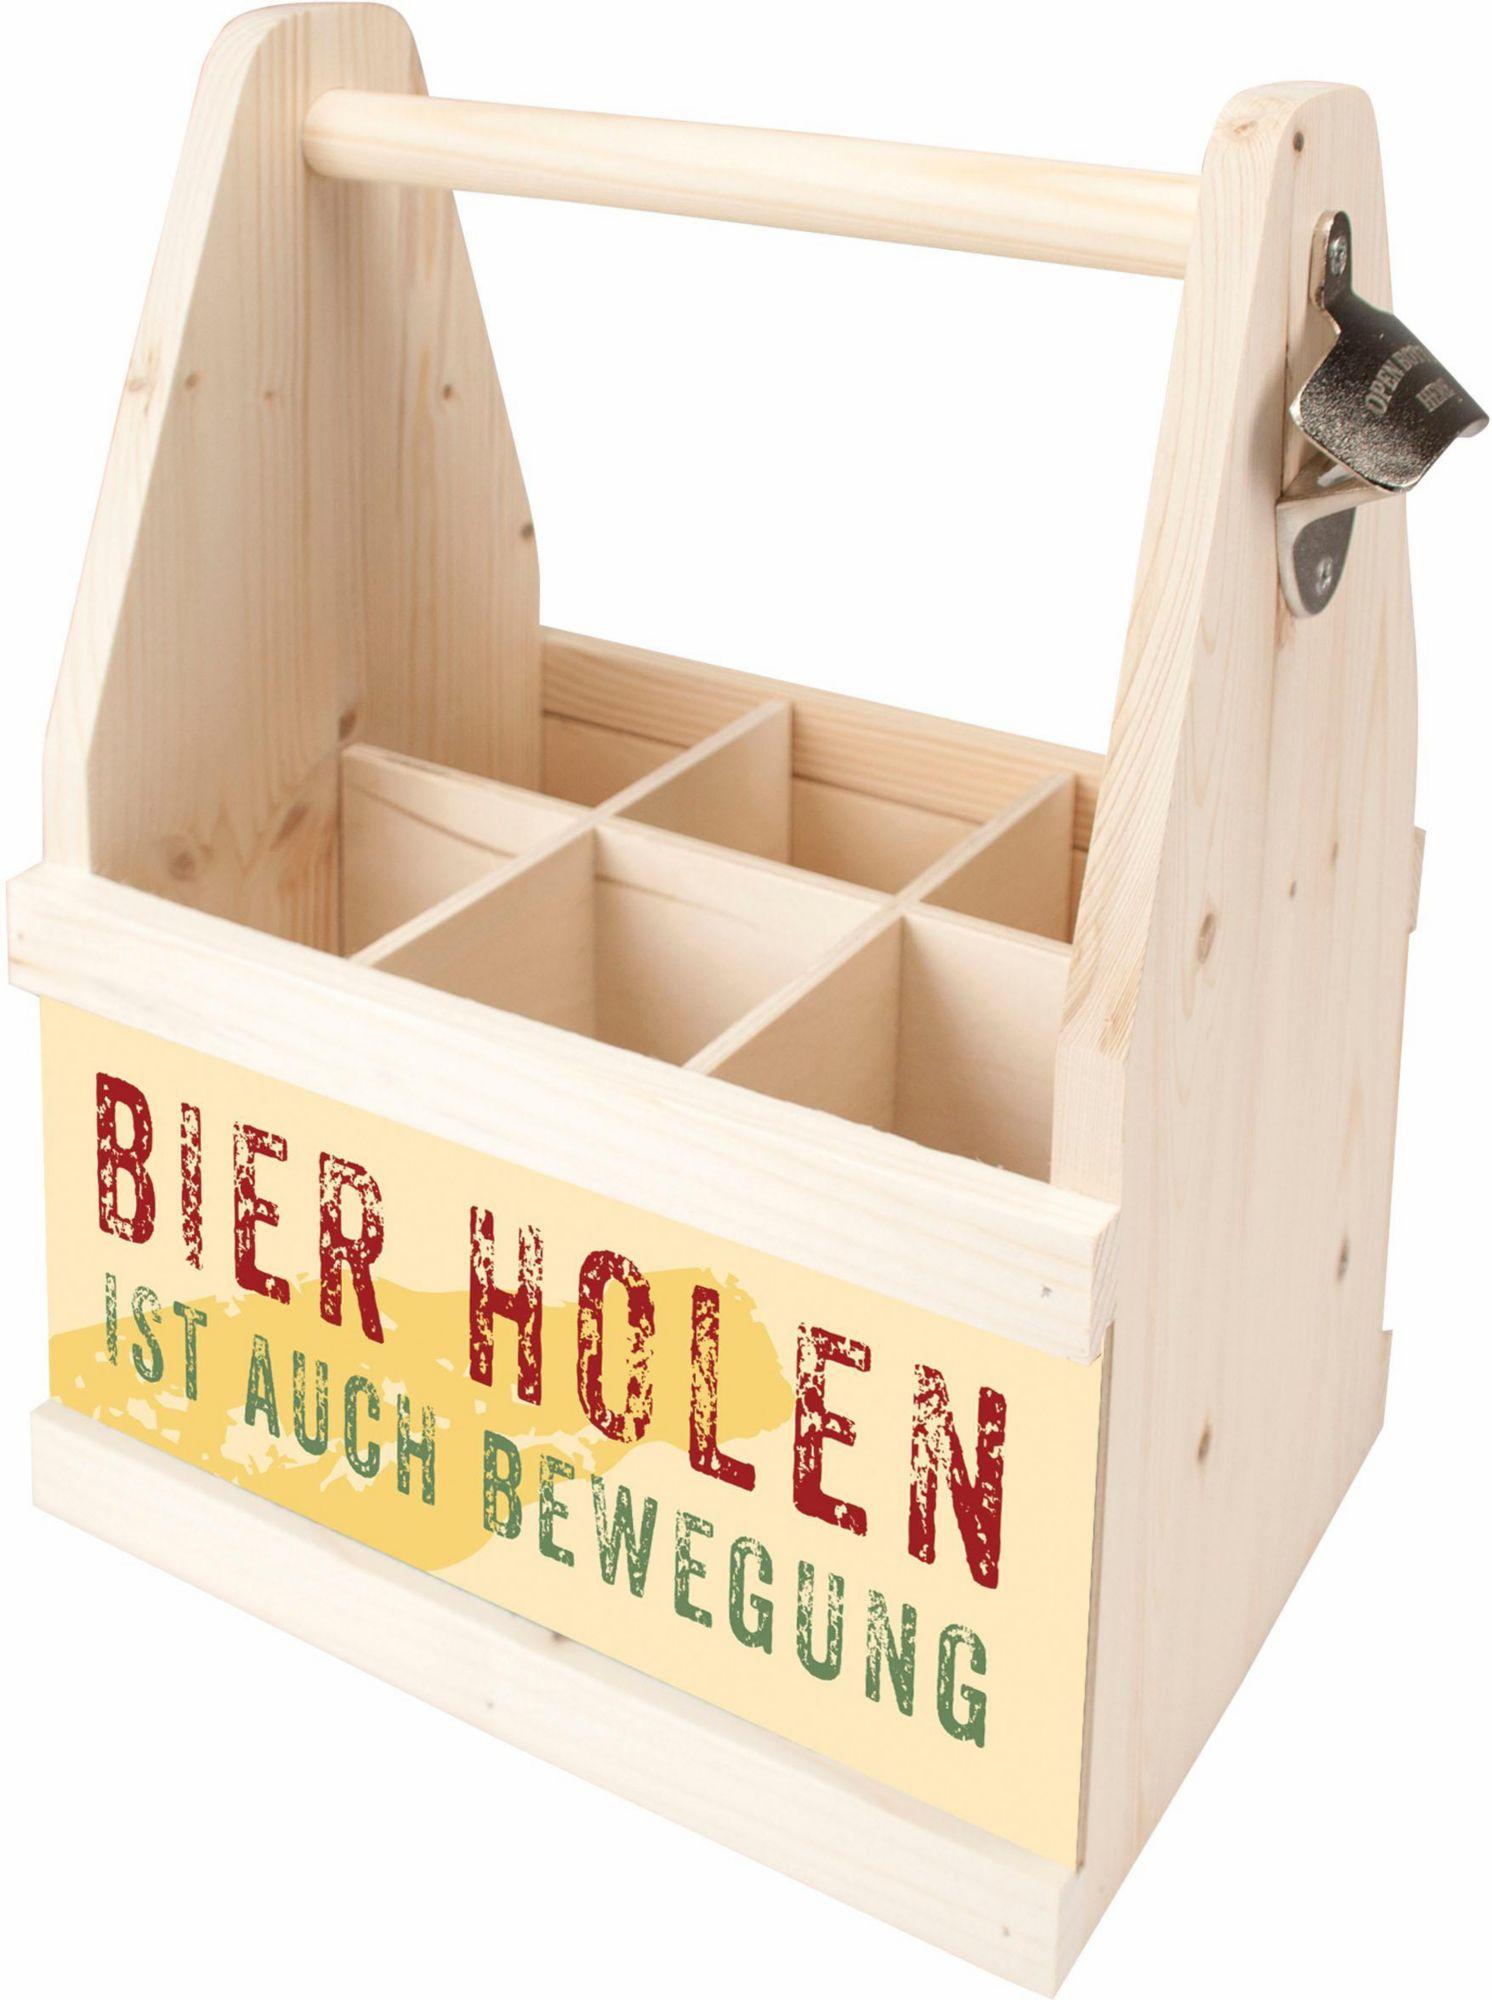 CONTENTO Contento Bier Caddy »Bierholen ist auch Bewegung«, Holz